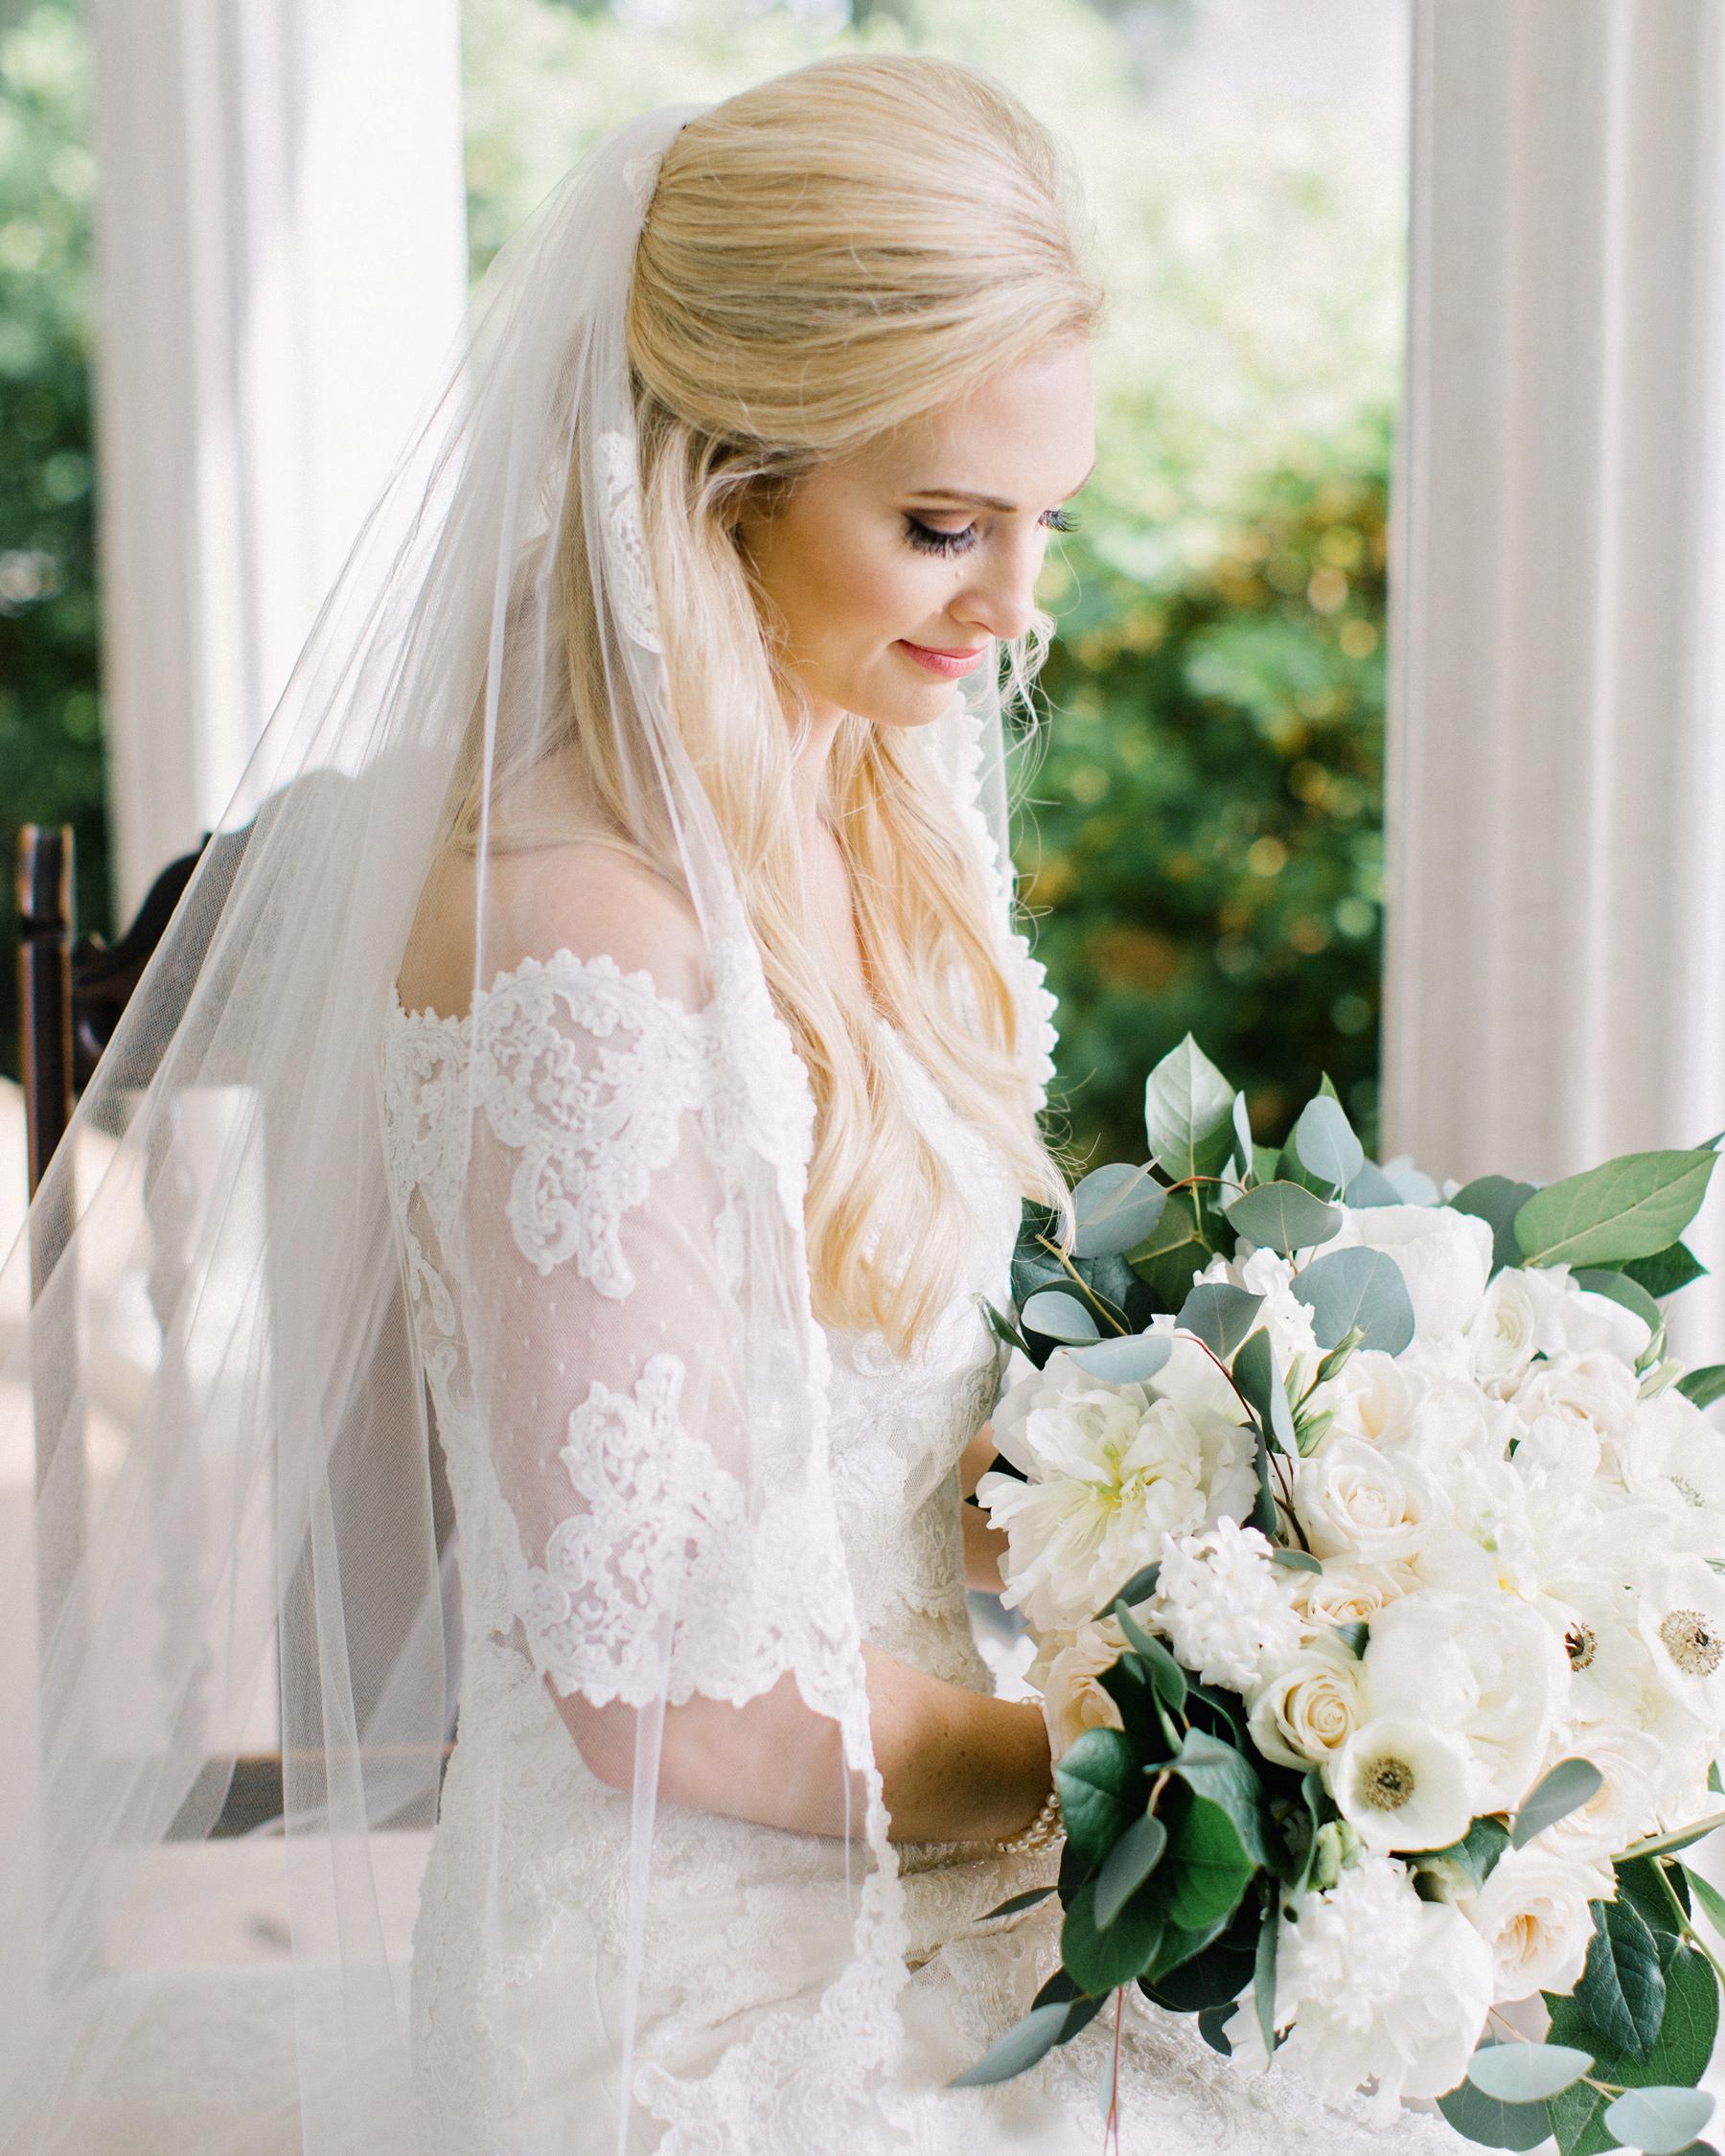 Wedding Hair Style For A Veil: Half-Up, Half-Down Wedding Hairstyles We Love